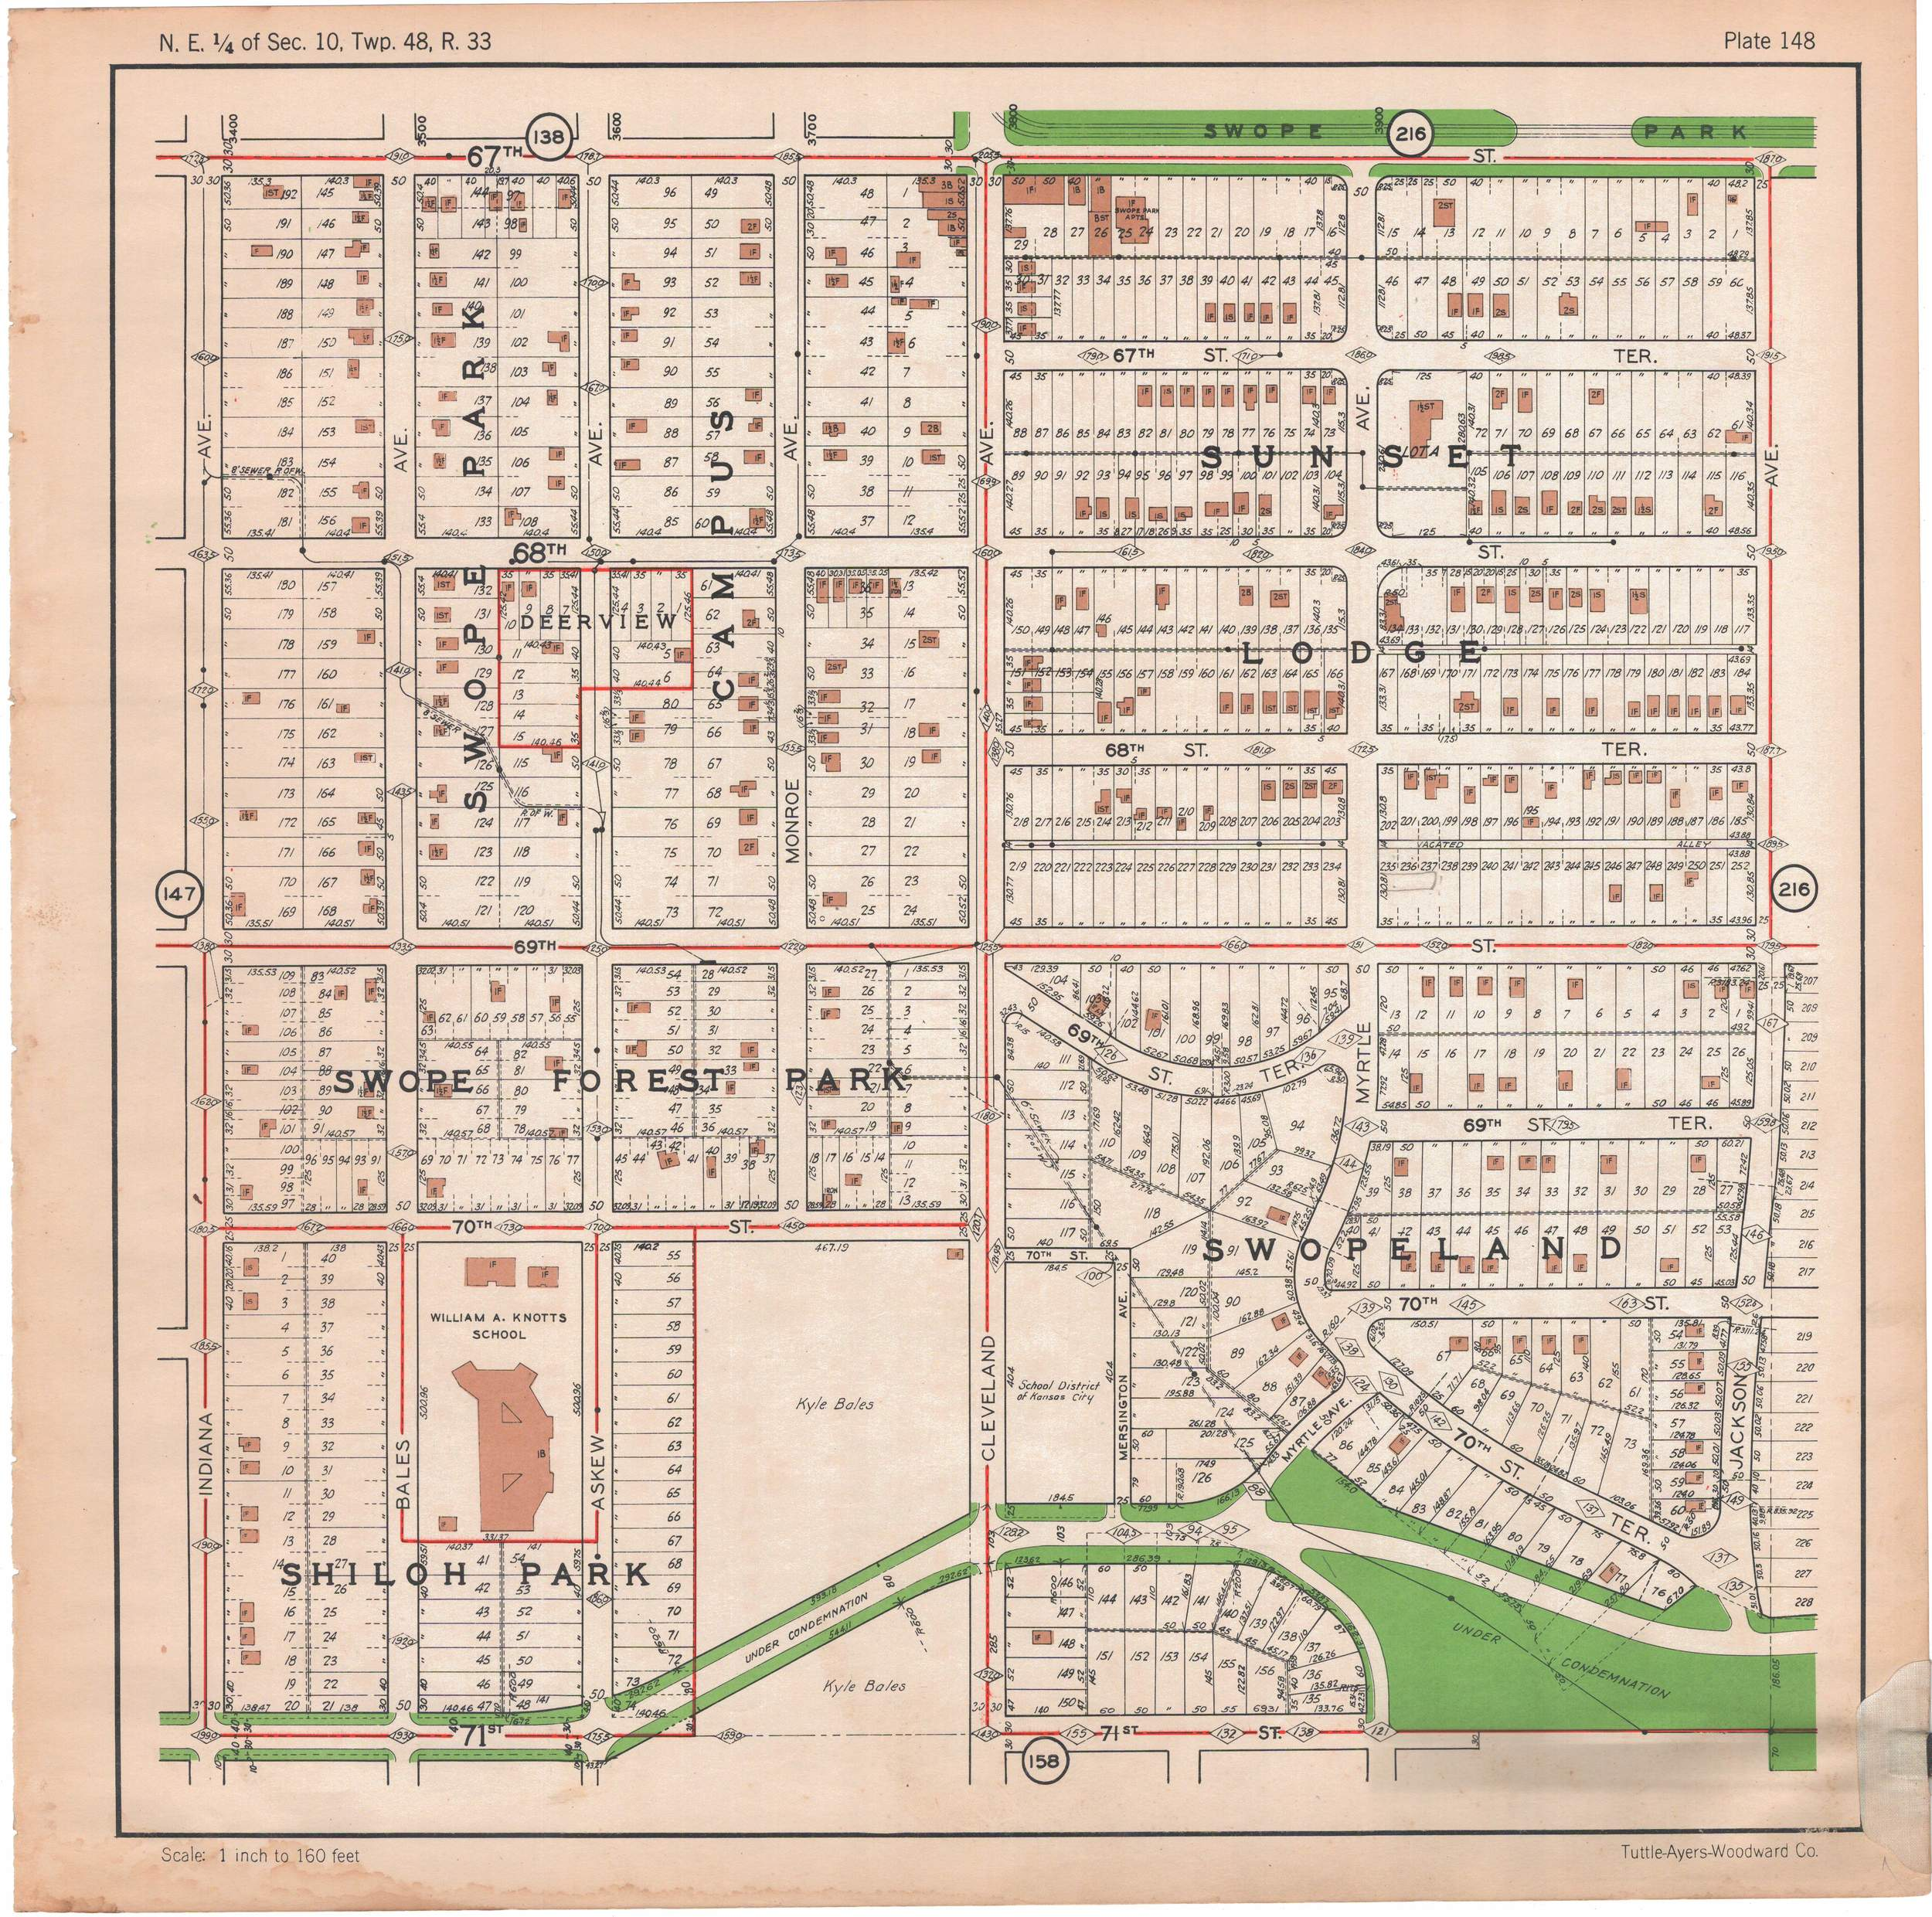 1925 TUTTLE_AYERS_Plate_148.JPG